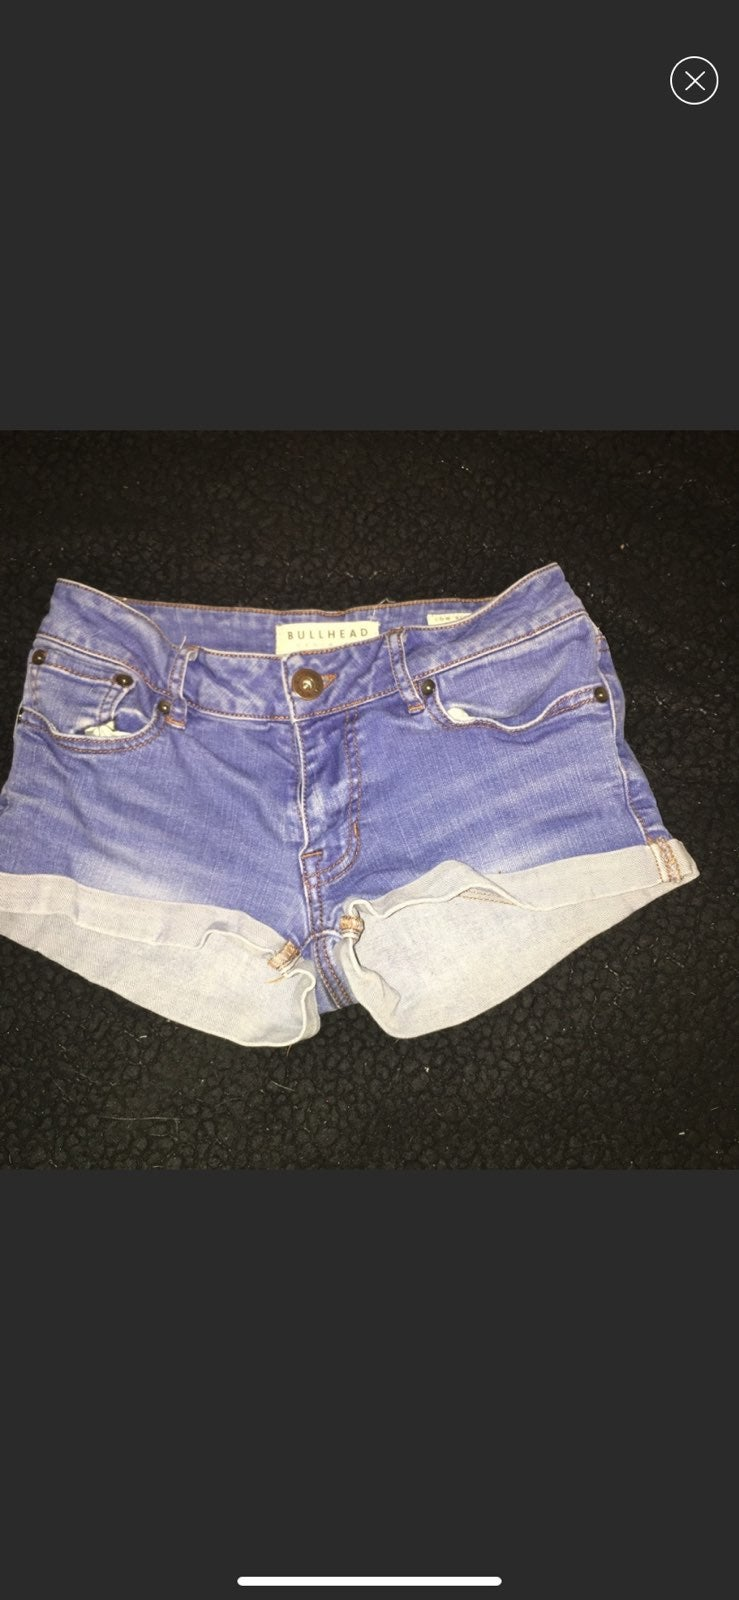 pacsun/bullhead low rise shorts